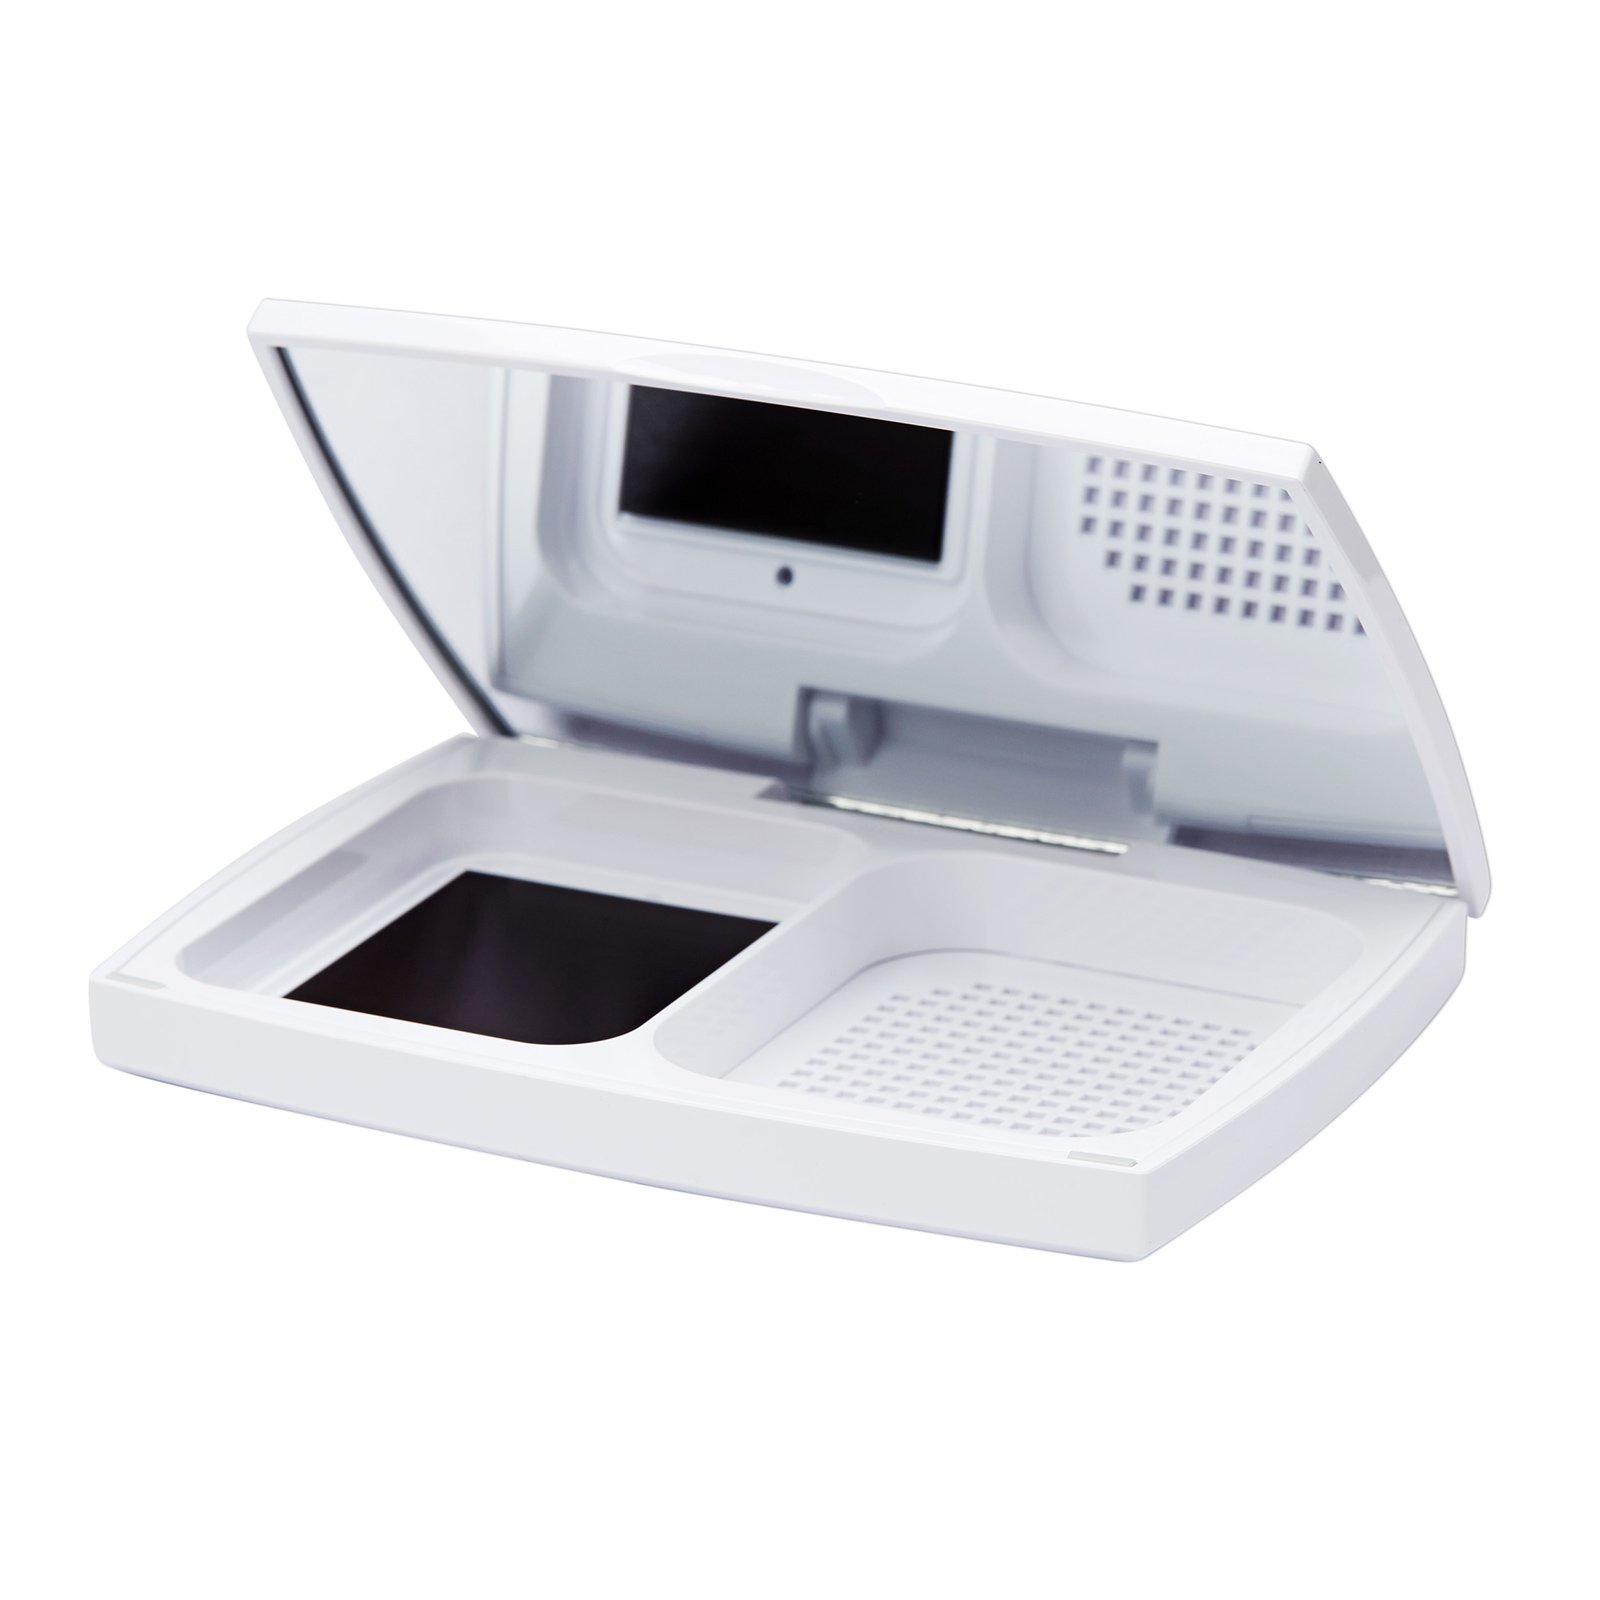 LANCÔME Blanc Expert  Slim Compact Case 1pc,